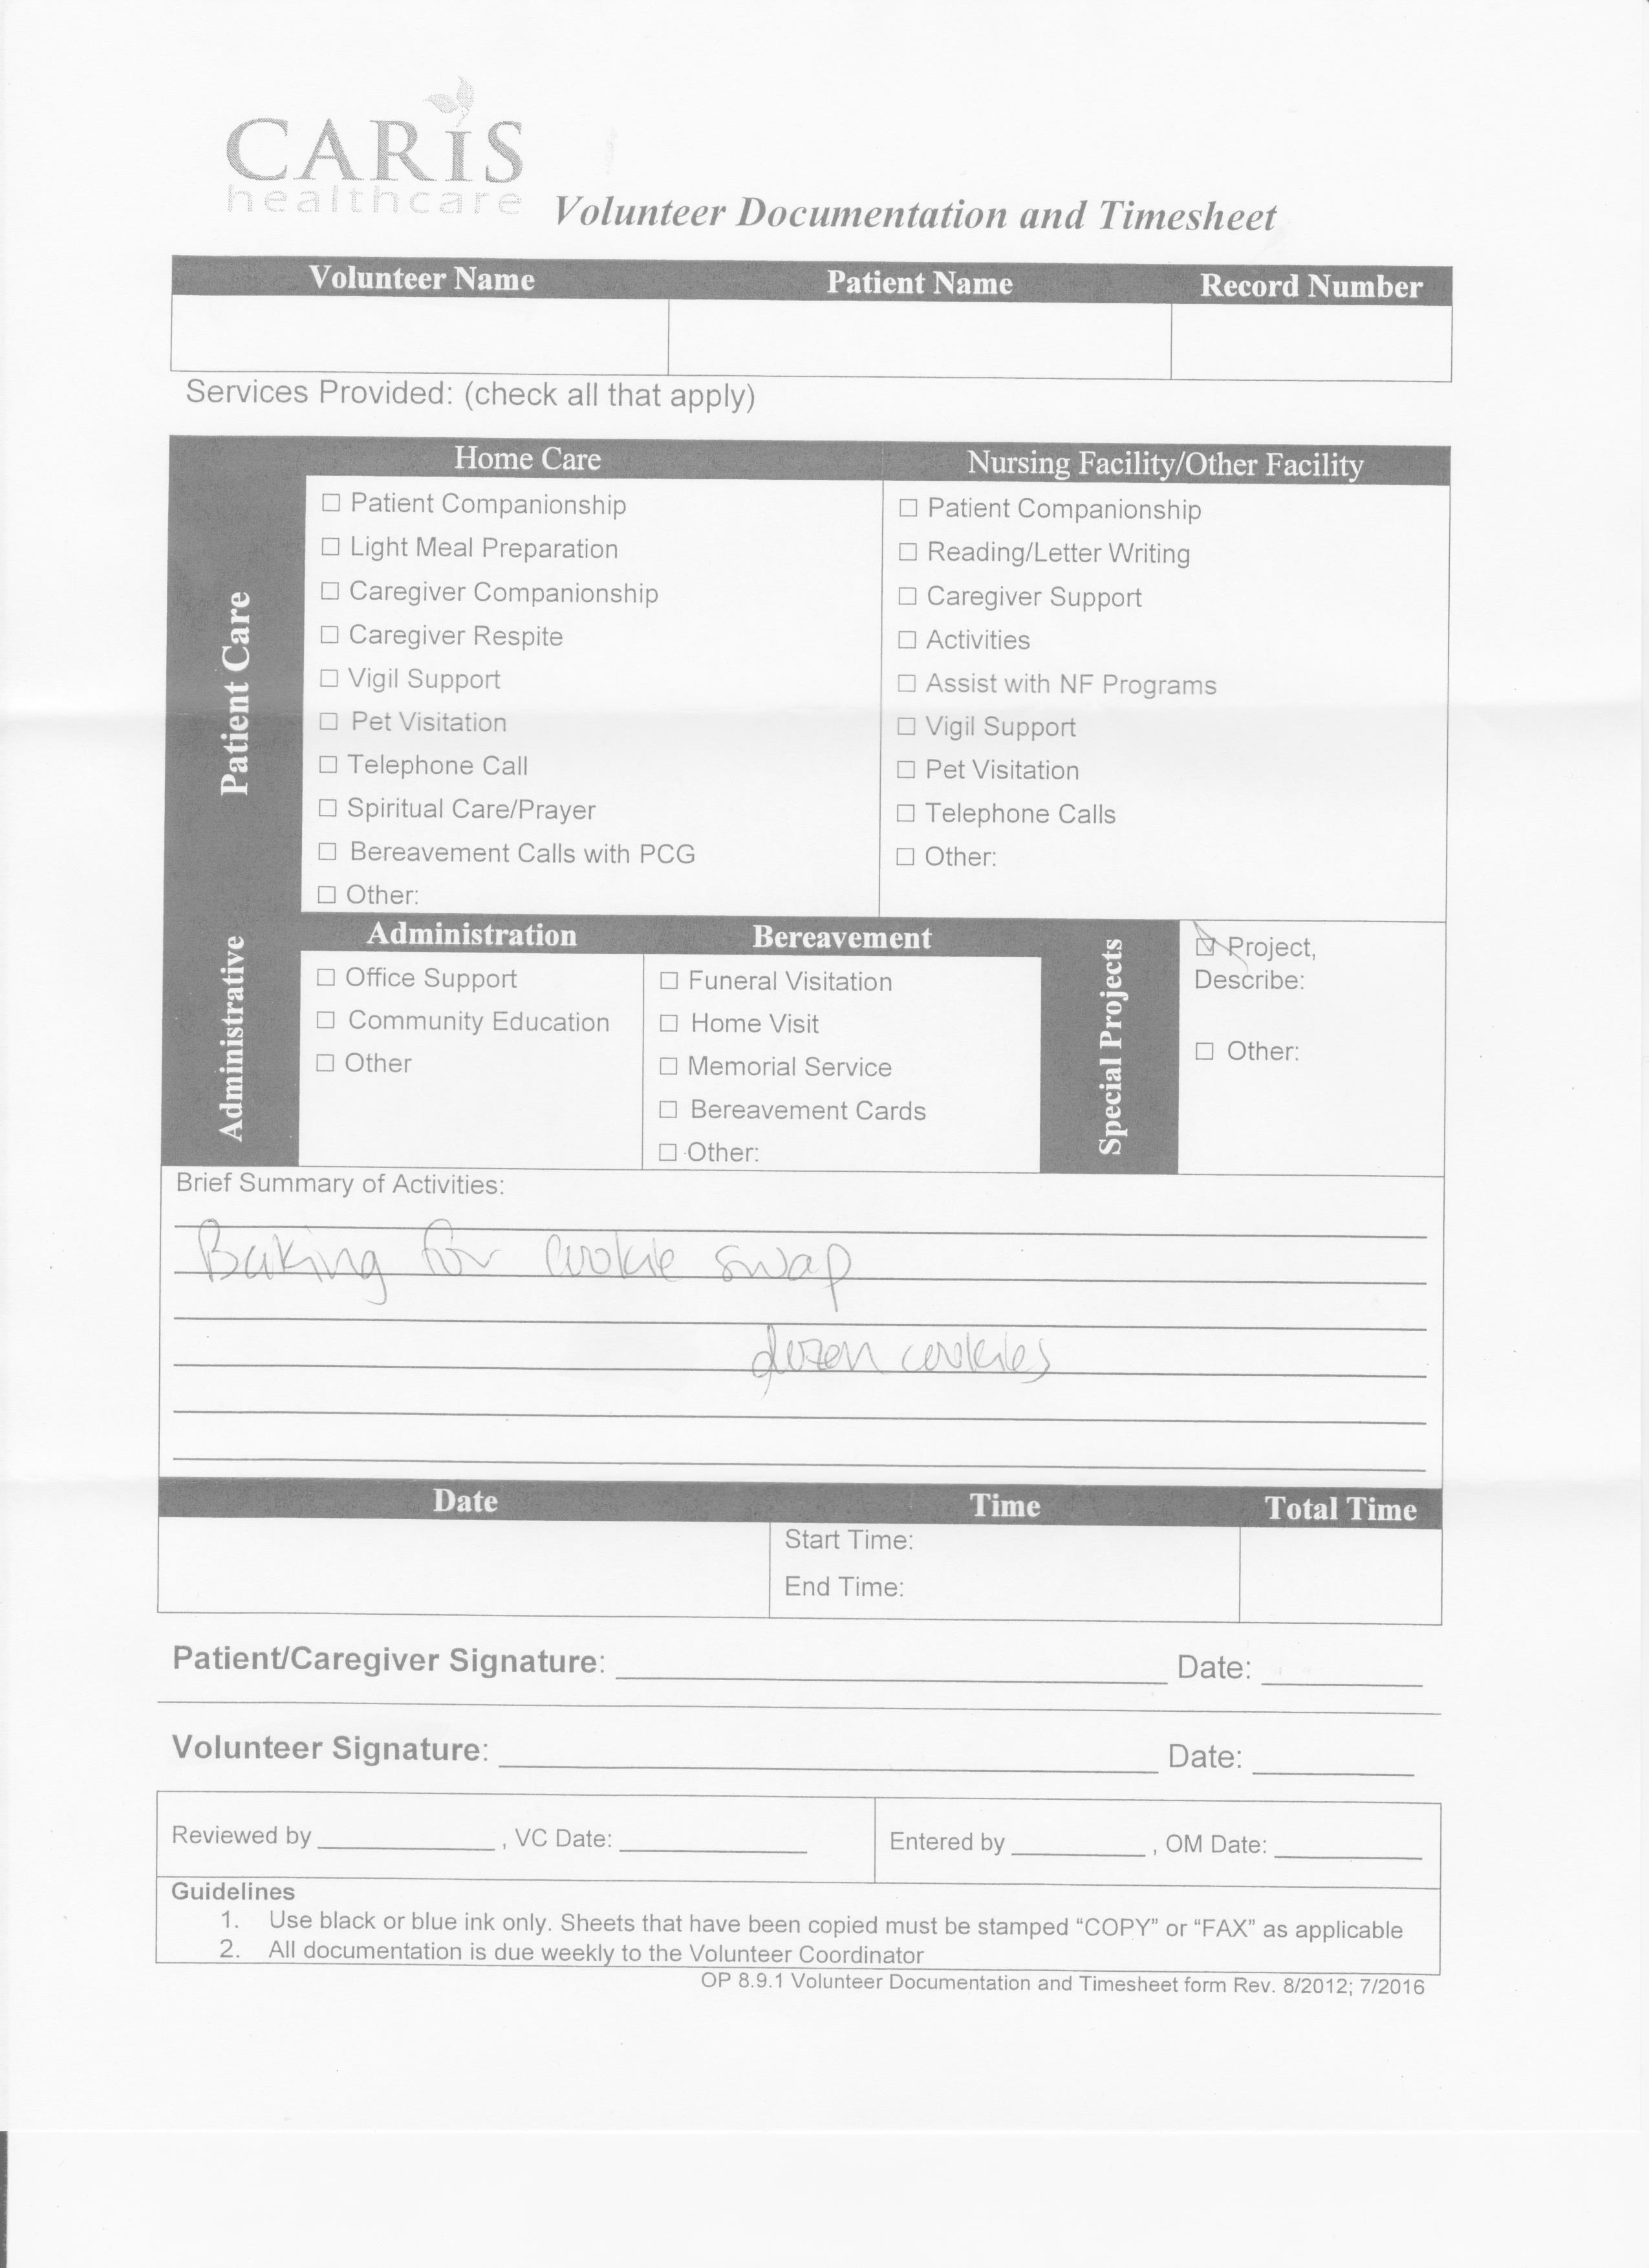 utk graduate school application deadline